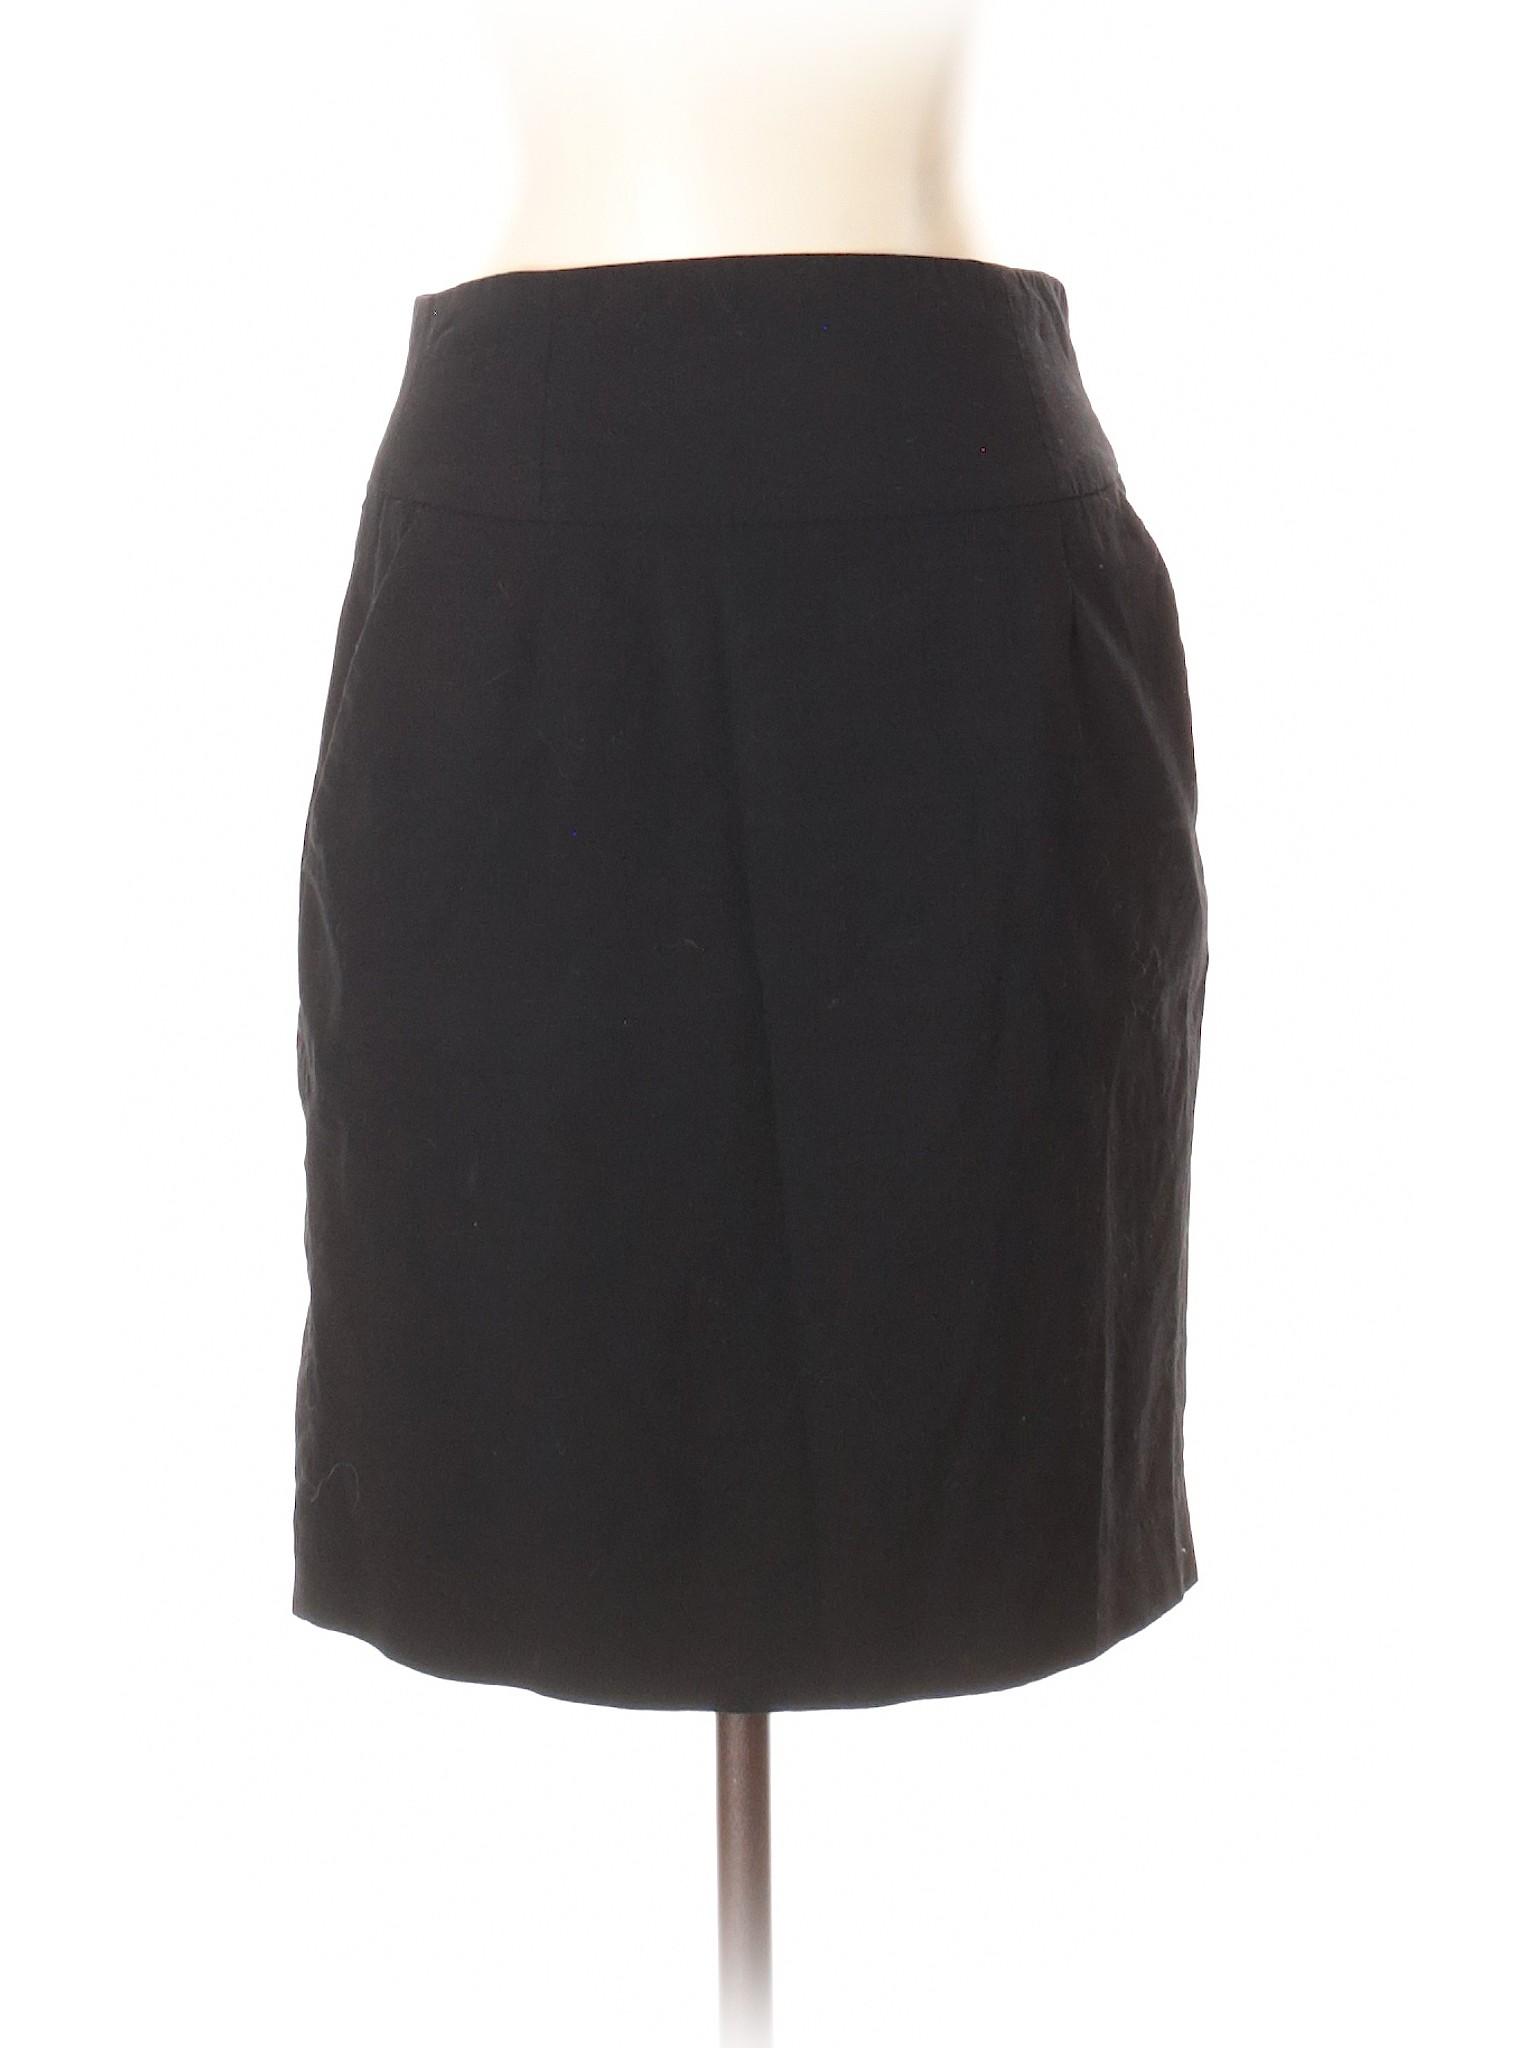 Skirt Boutique Republic Banana leisure Wool Oq4ZwRn